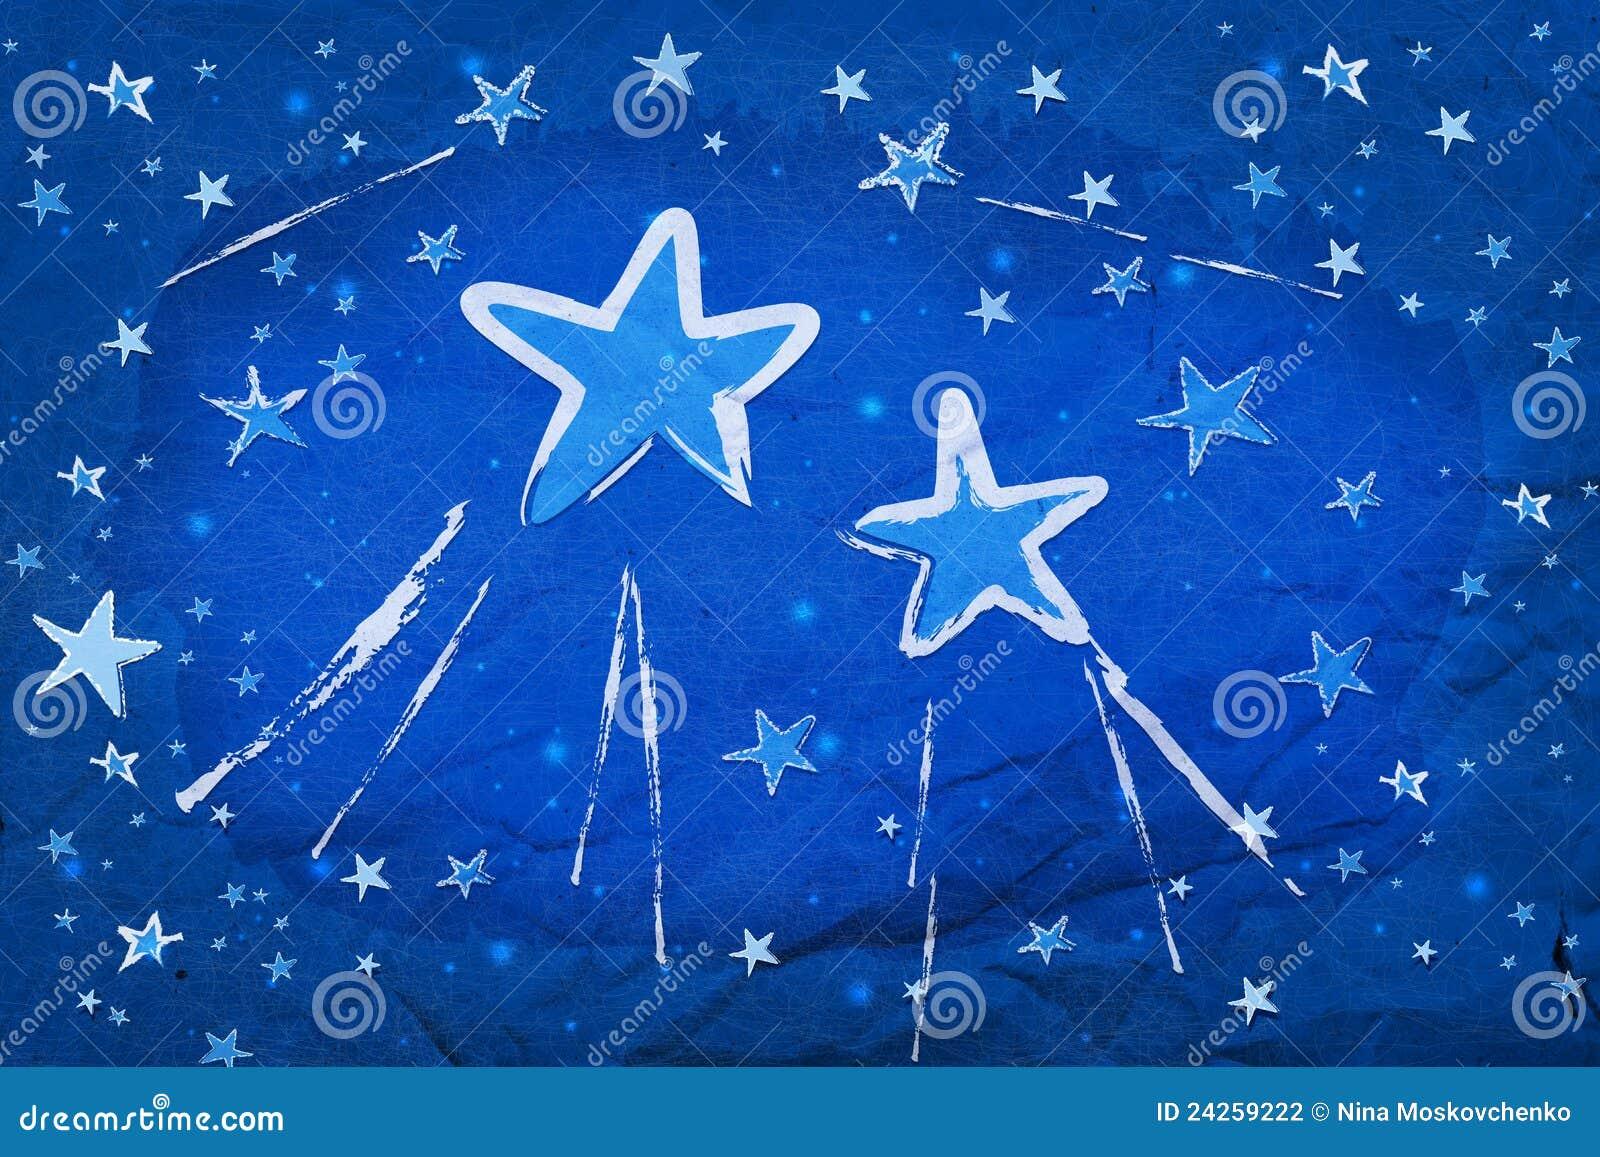 Stars on blue paper